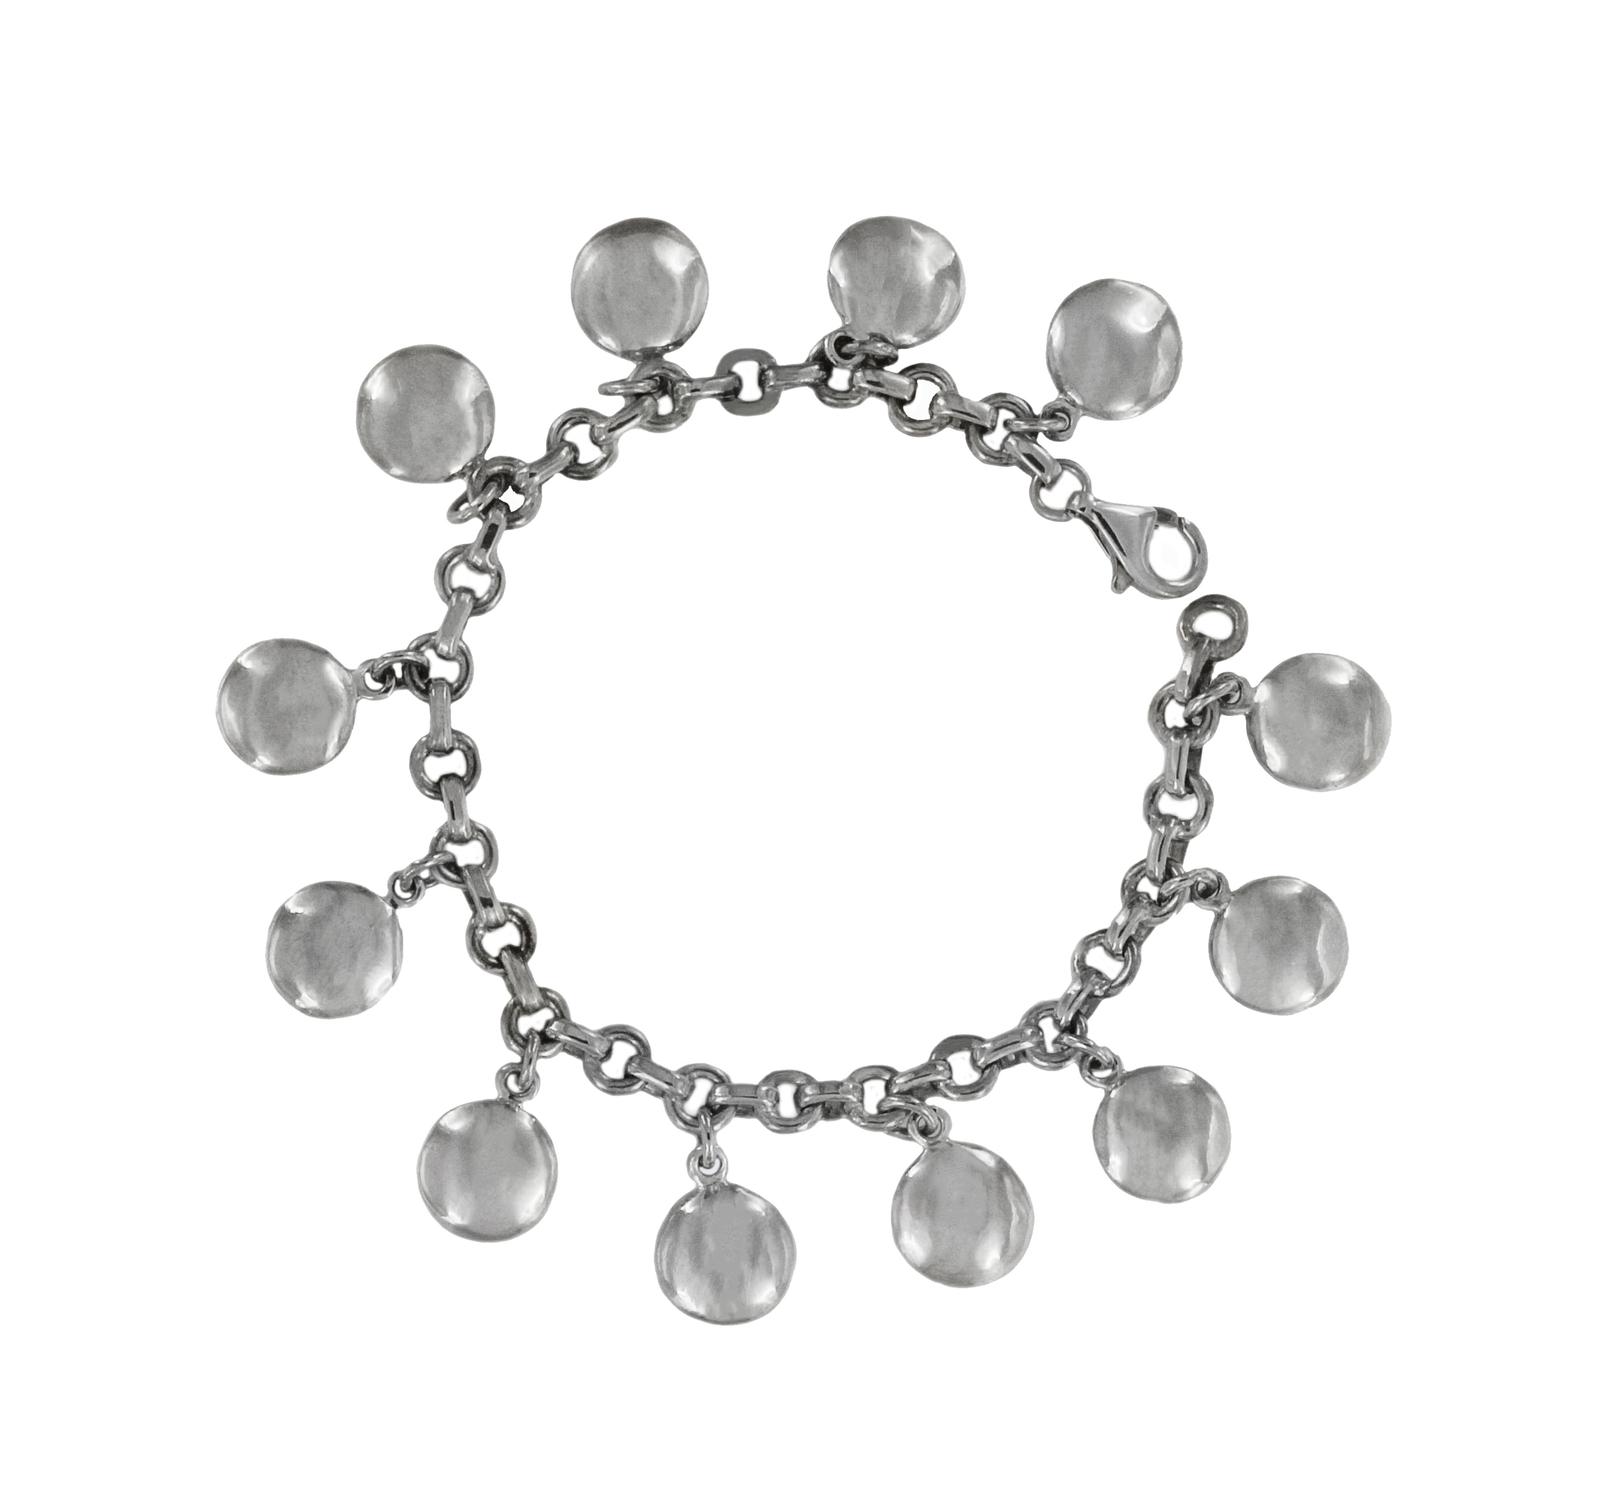 Tiffany & Co Silver Dangling Round Discs Charm Bracelet  - $780.00